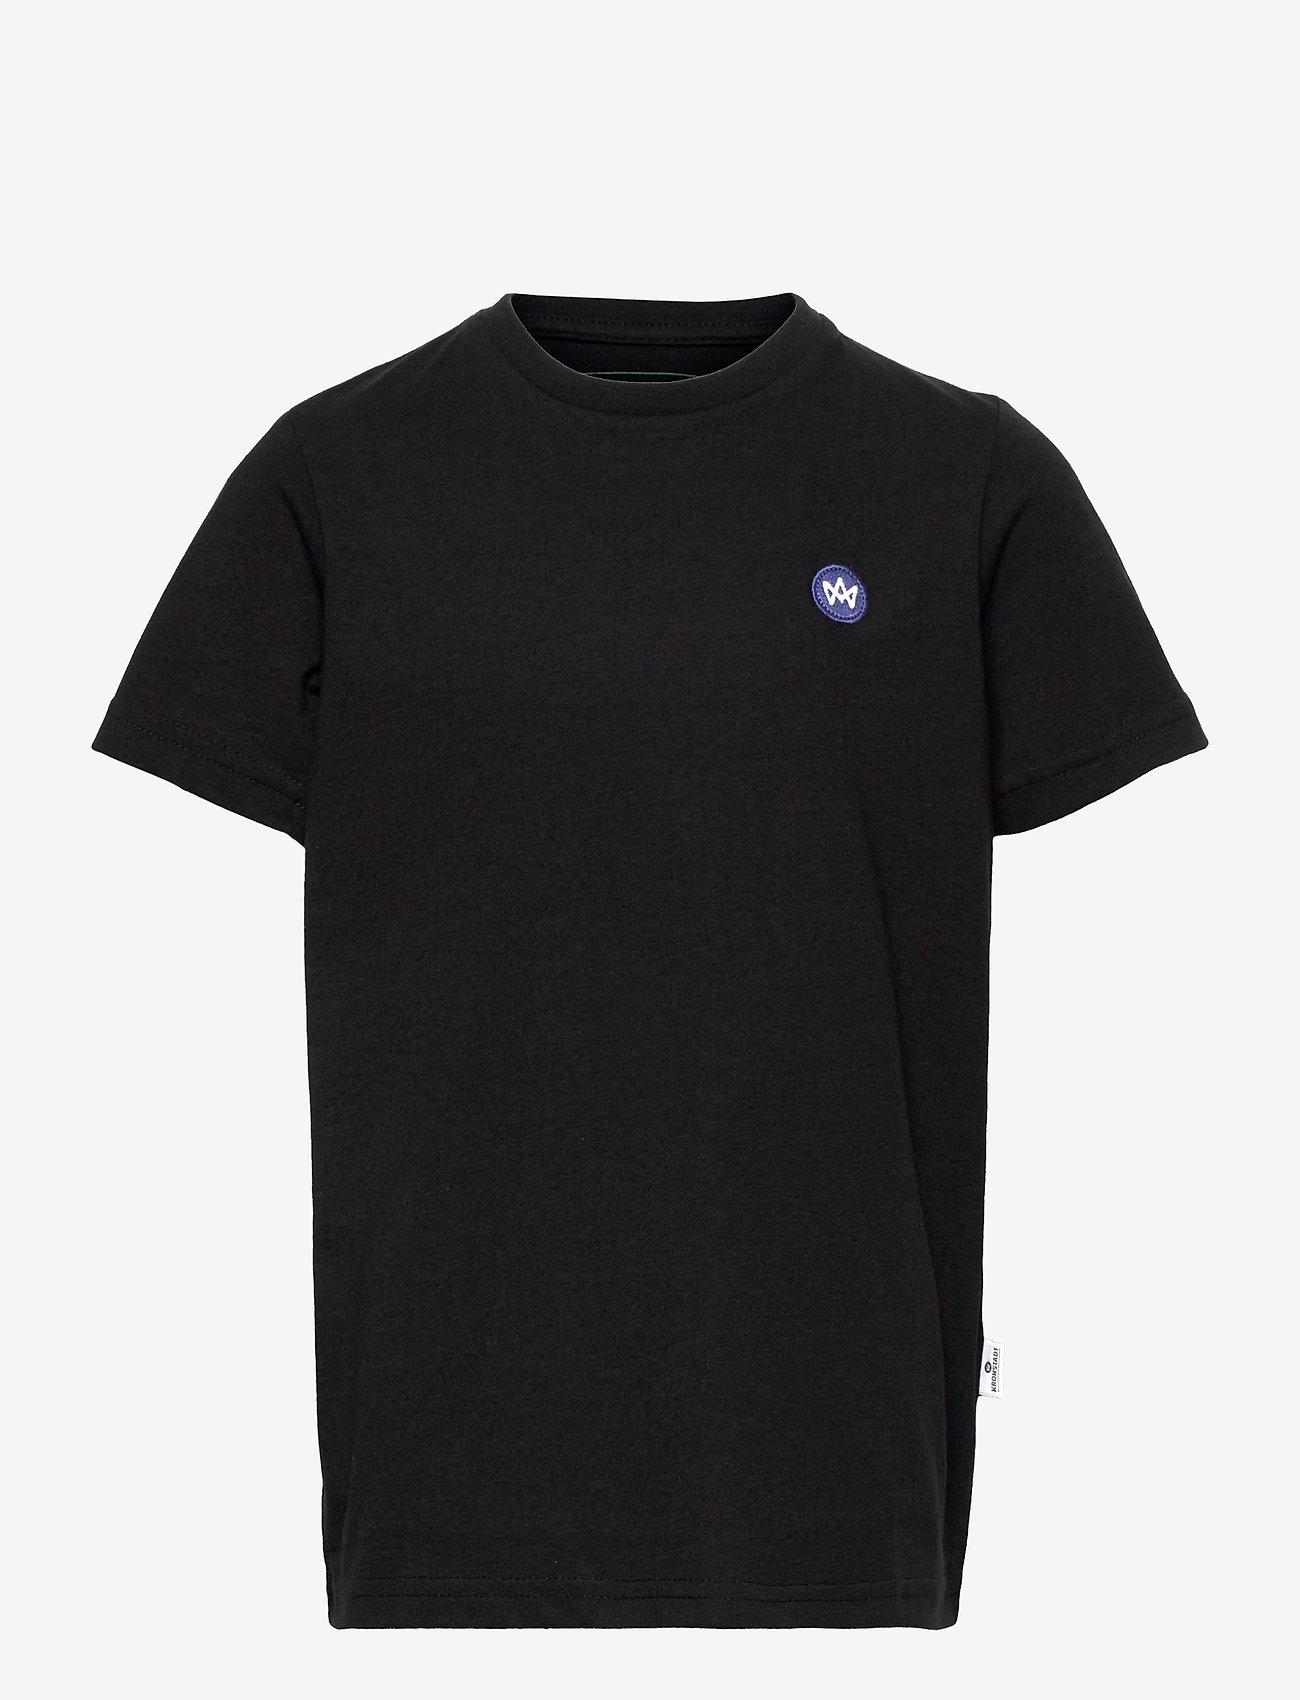 Kronstadt - Timmi Recycled - short-sleeved - black - 0